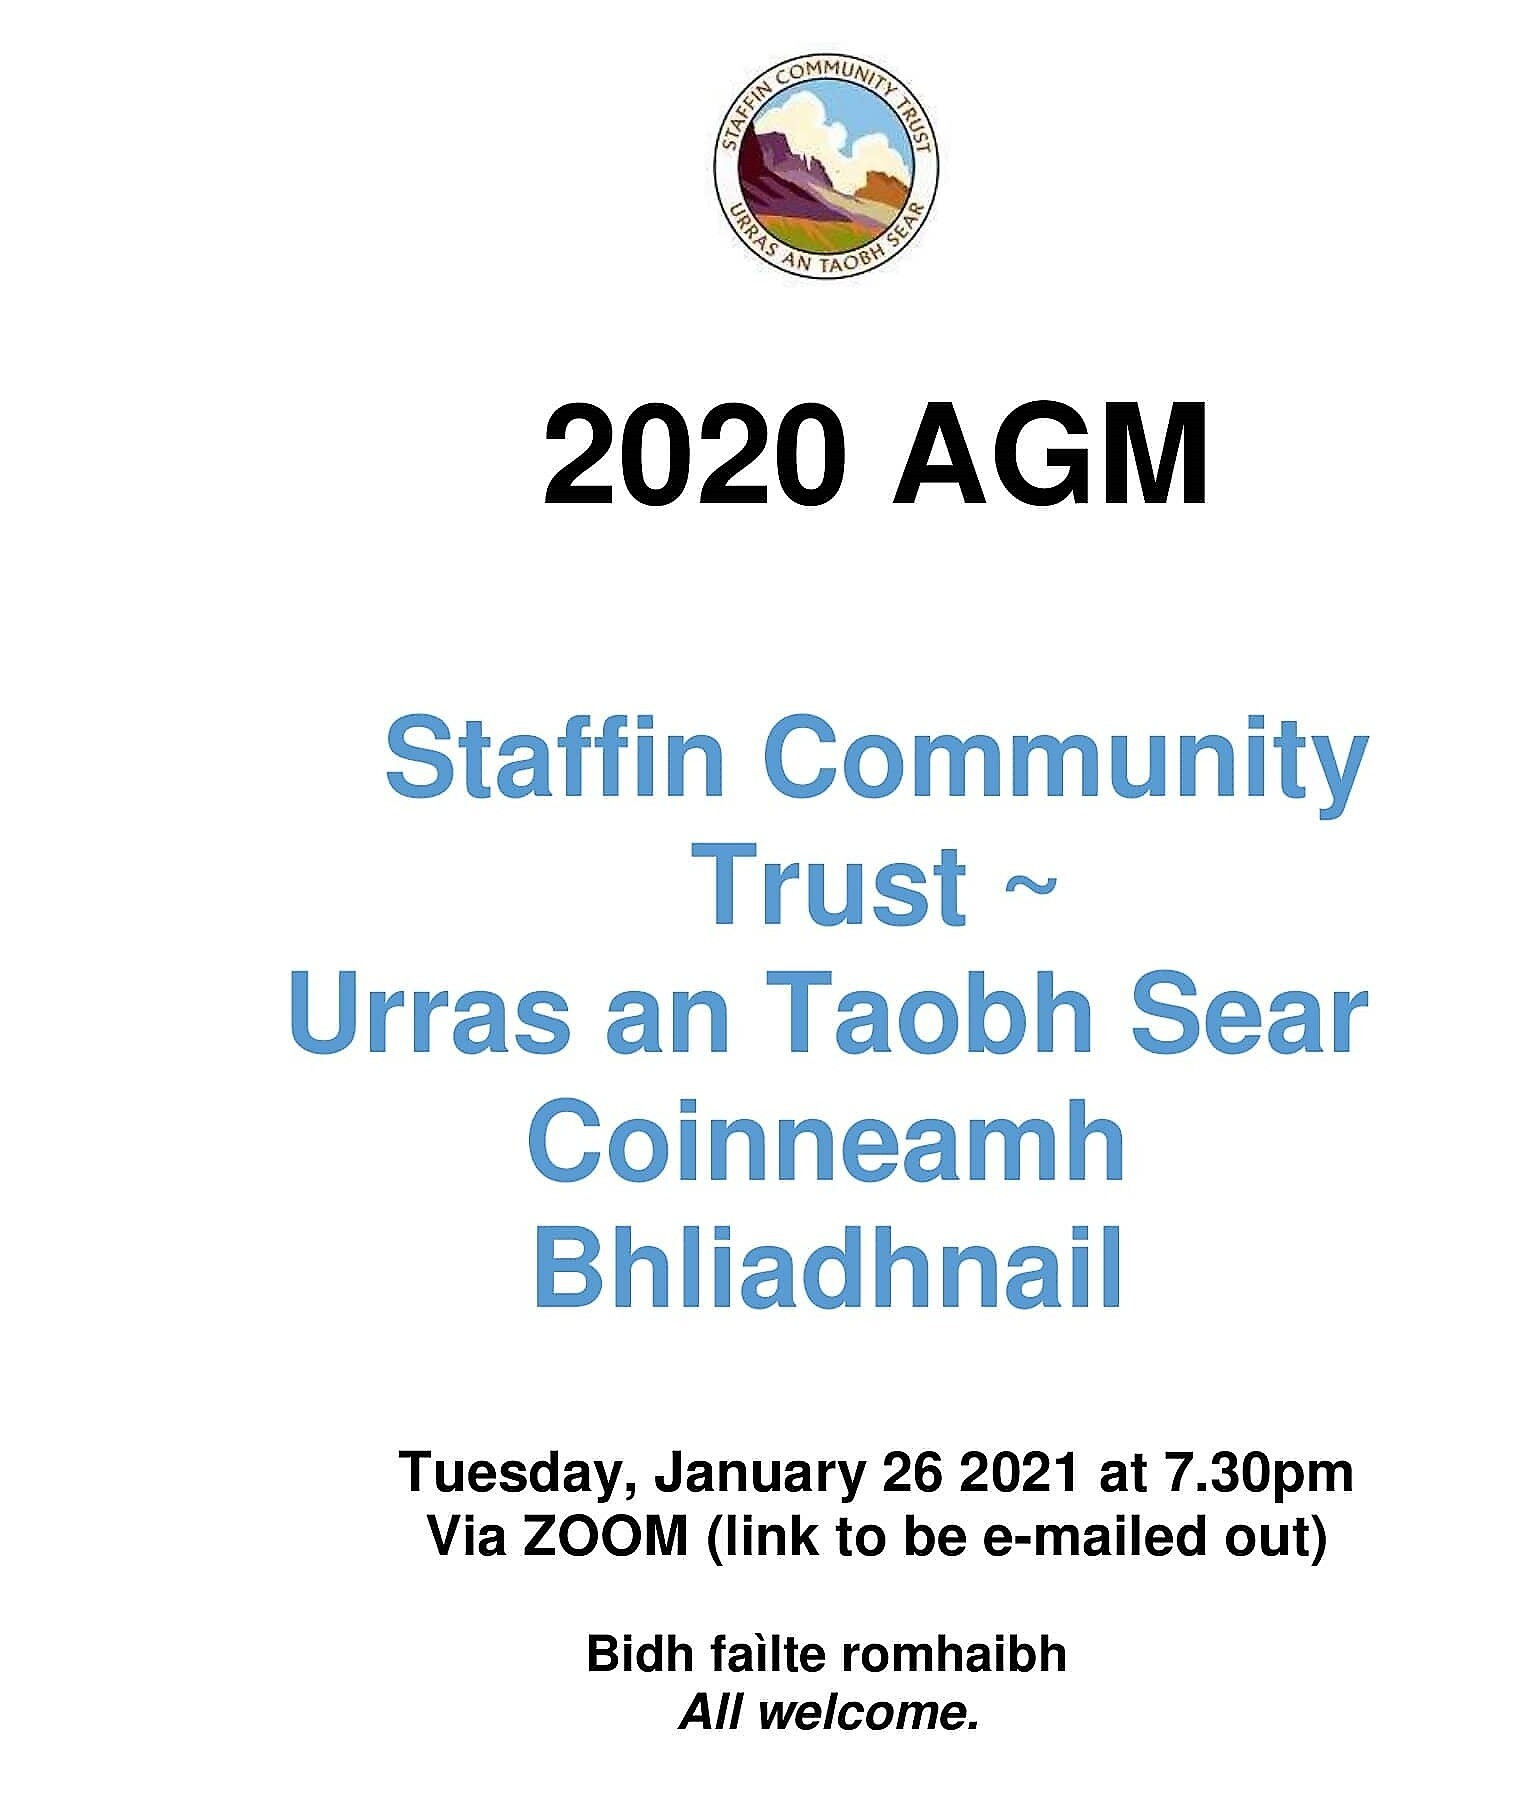 Staffin Community Trust's first digital AGM